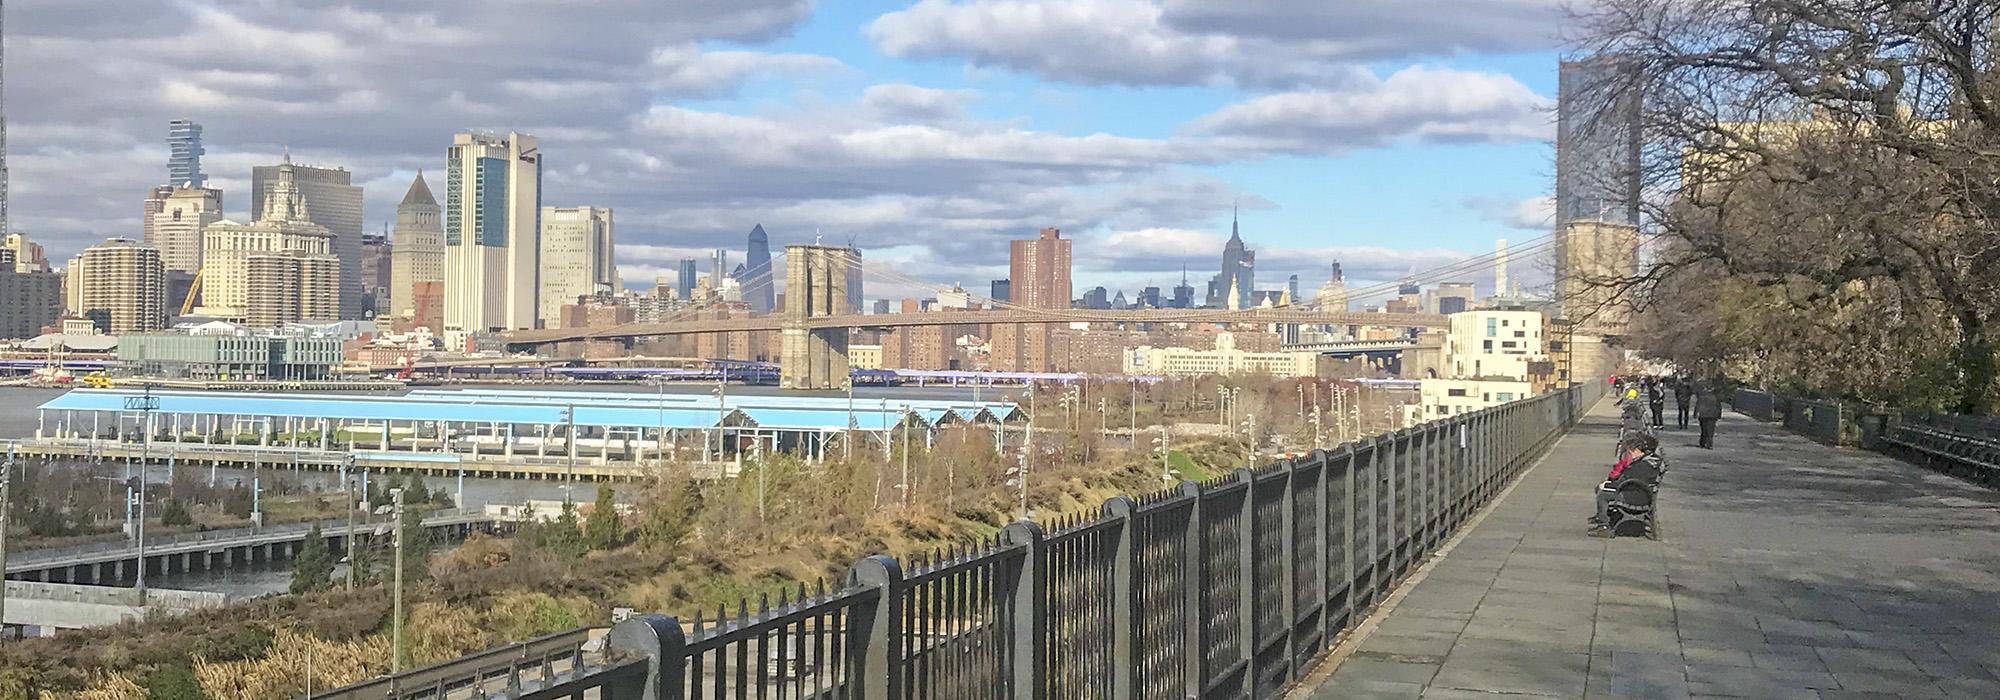 NY_NewYorkCity_BrooklynPromenade_ClassicView_byKatherineDavis_2018_004_Hero.jpg